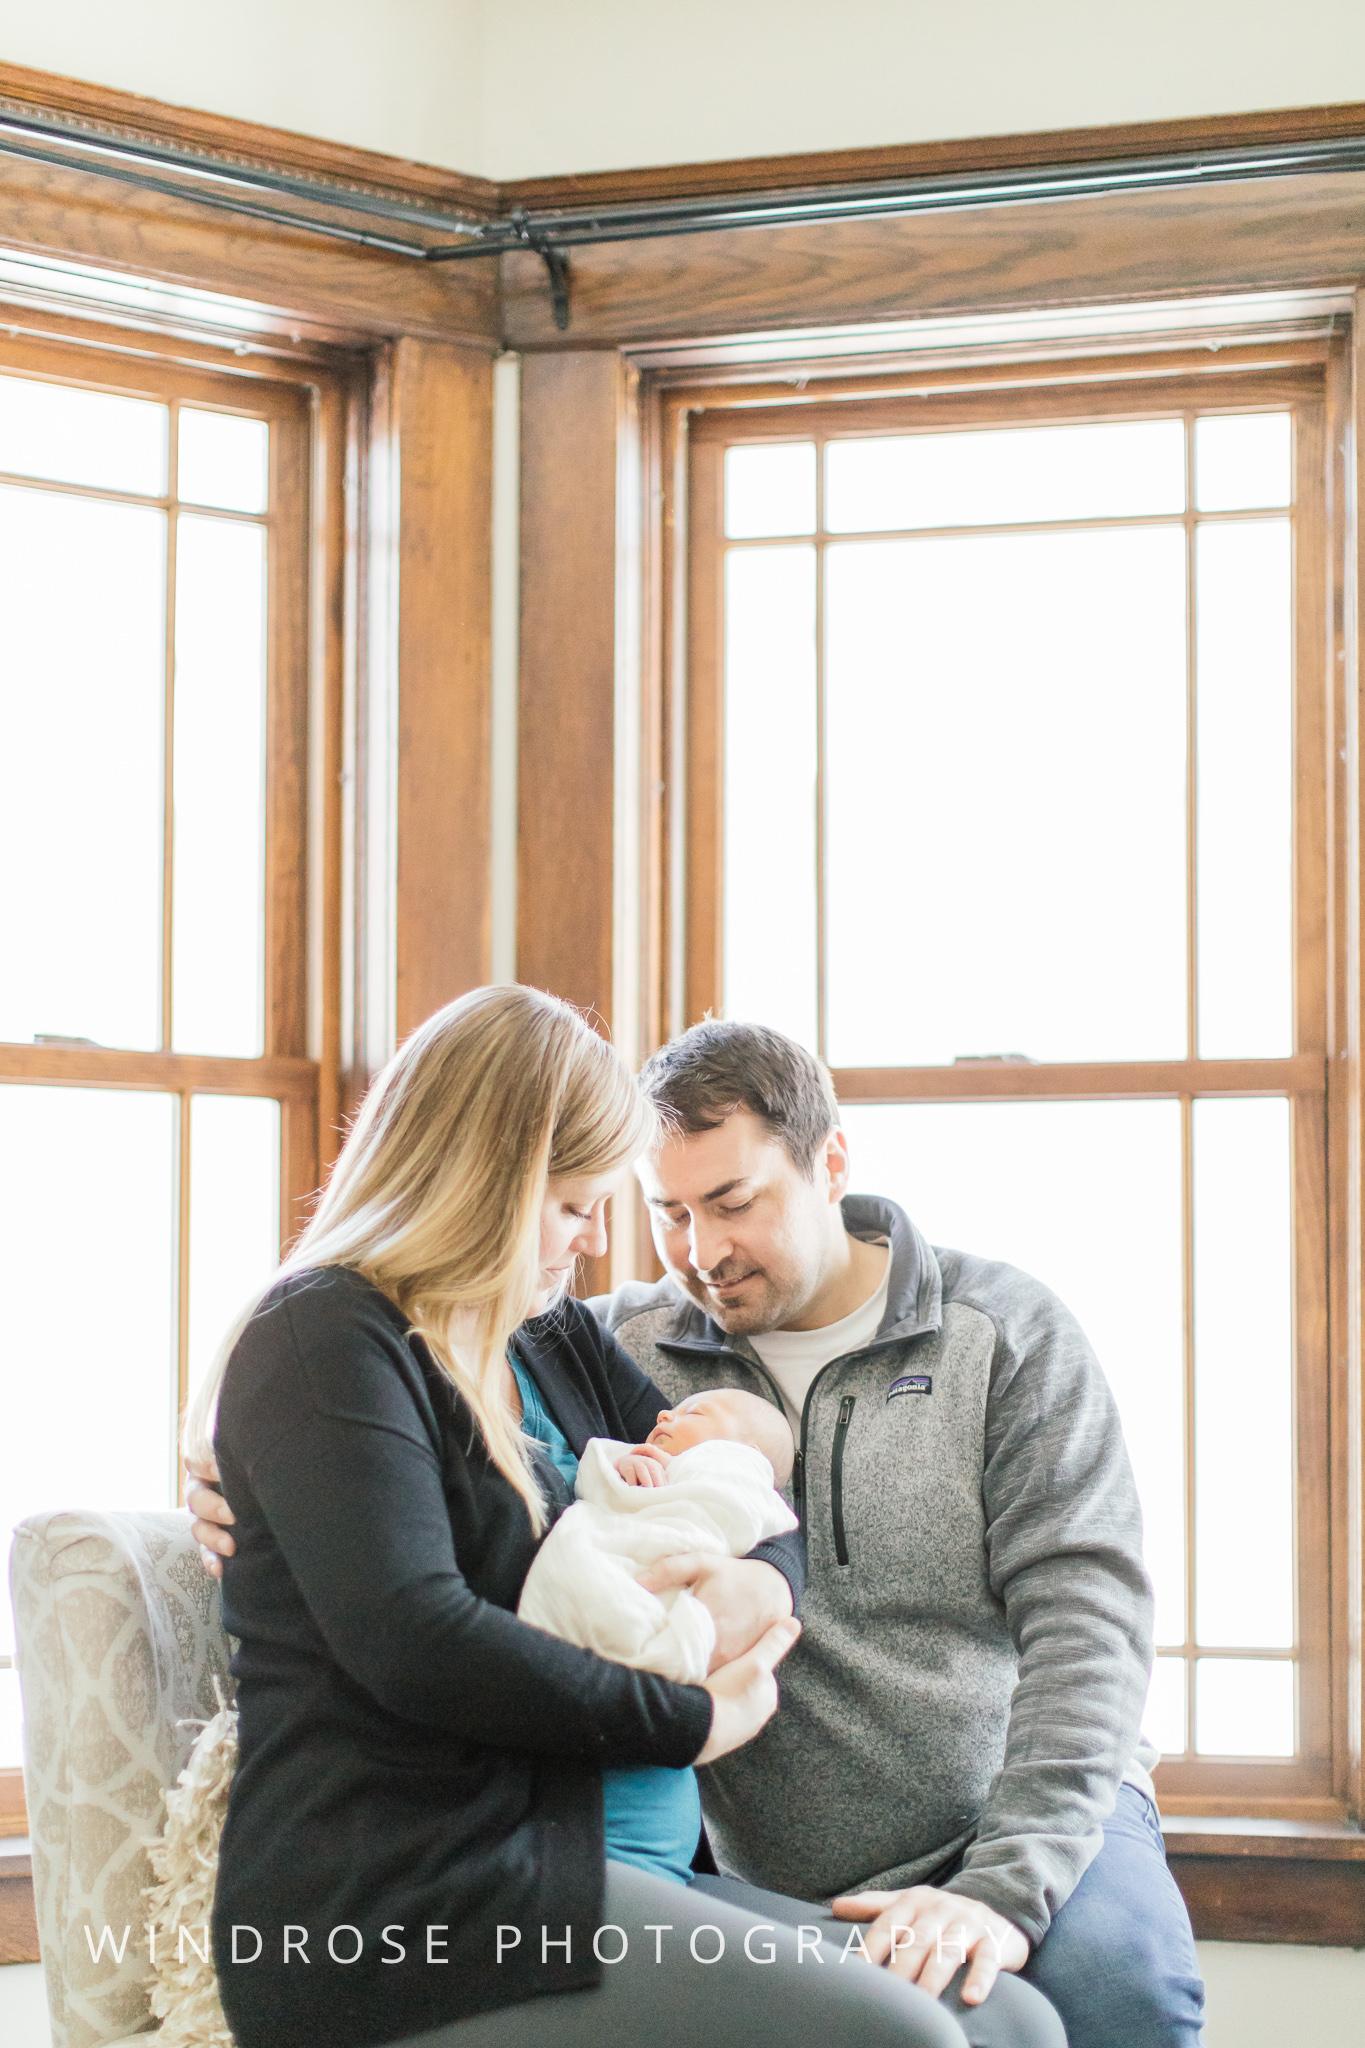 Newborn-Photography-Session-Rochester-MN-22.jpg